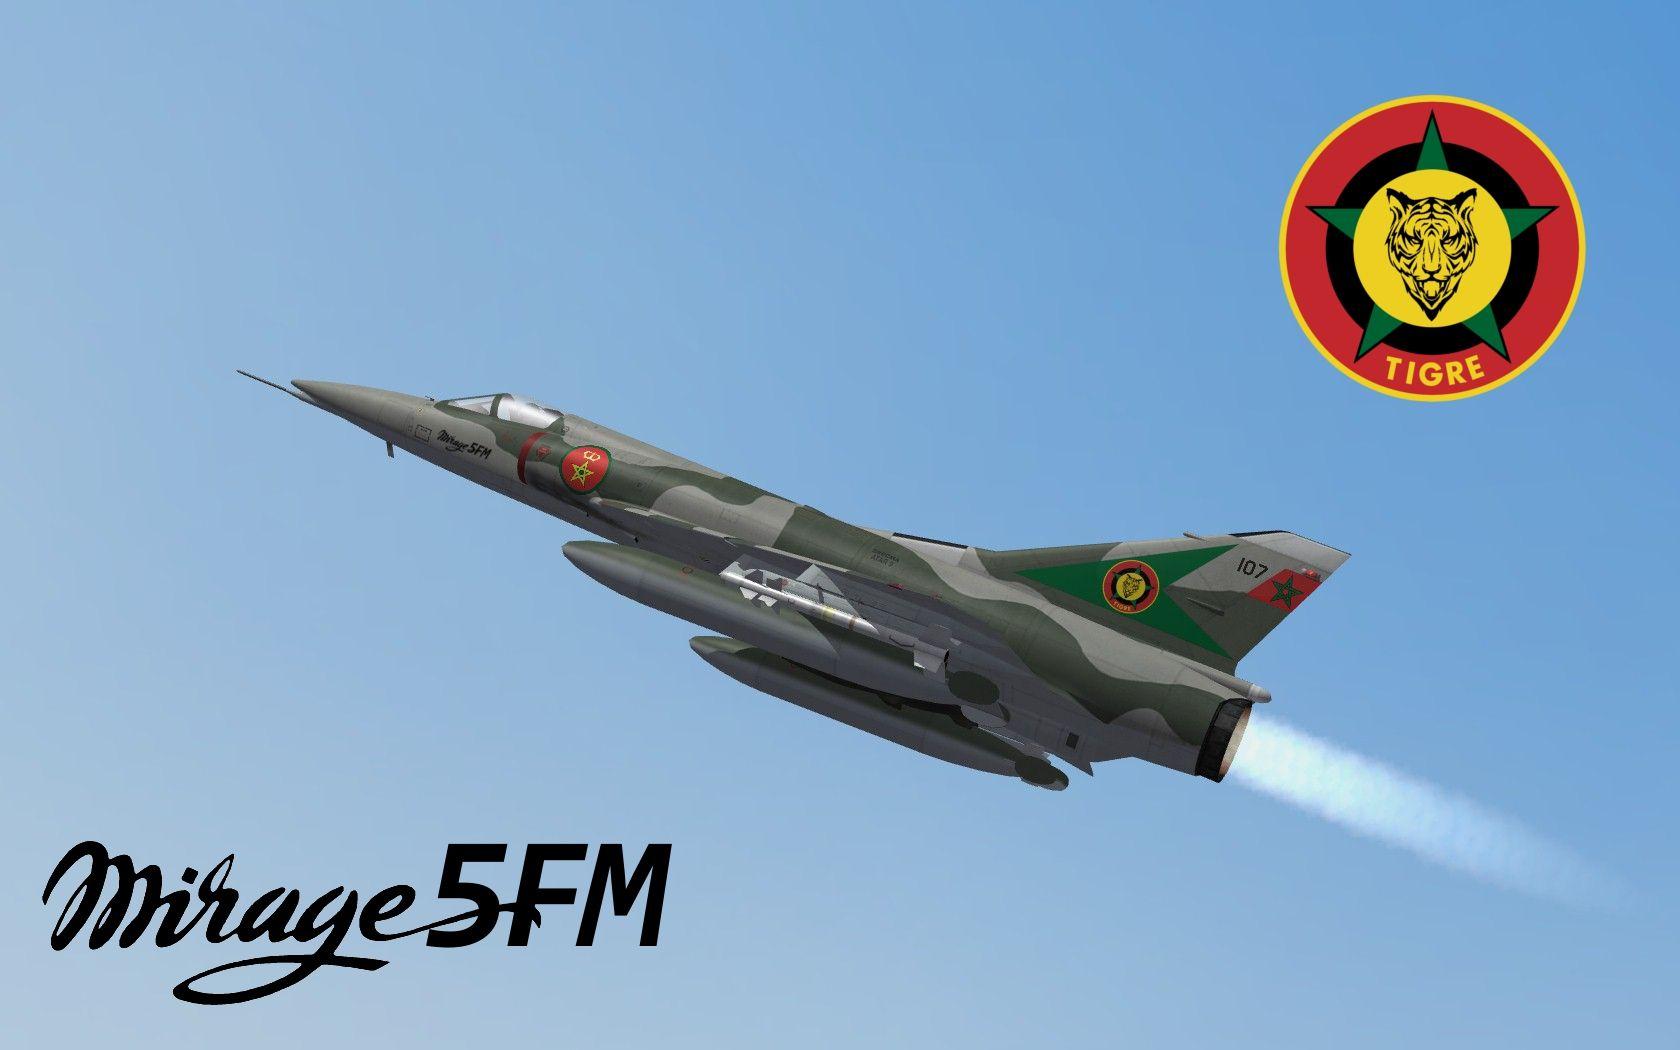 MOROCCOMIRAGE5FM13.jpg